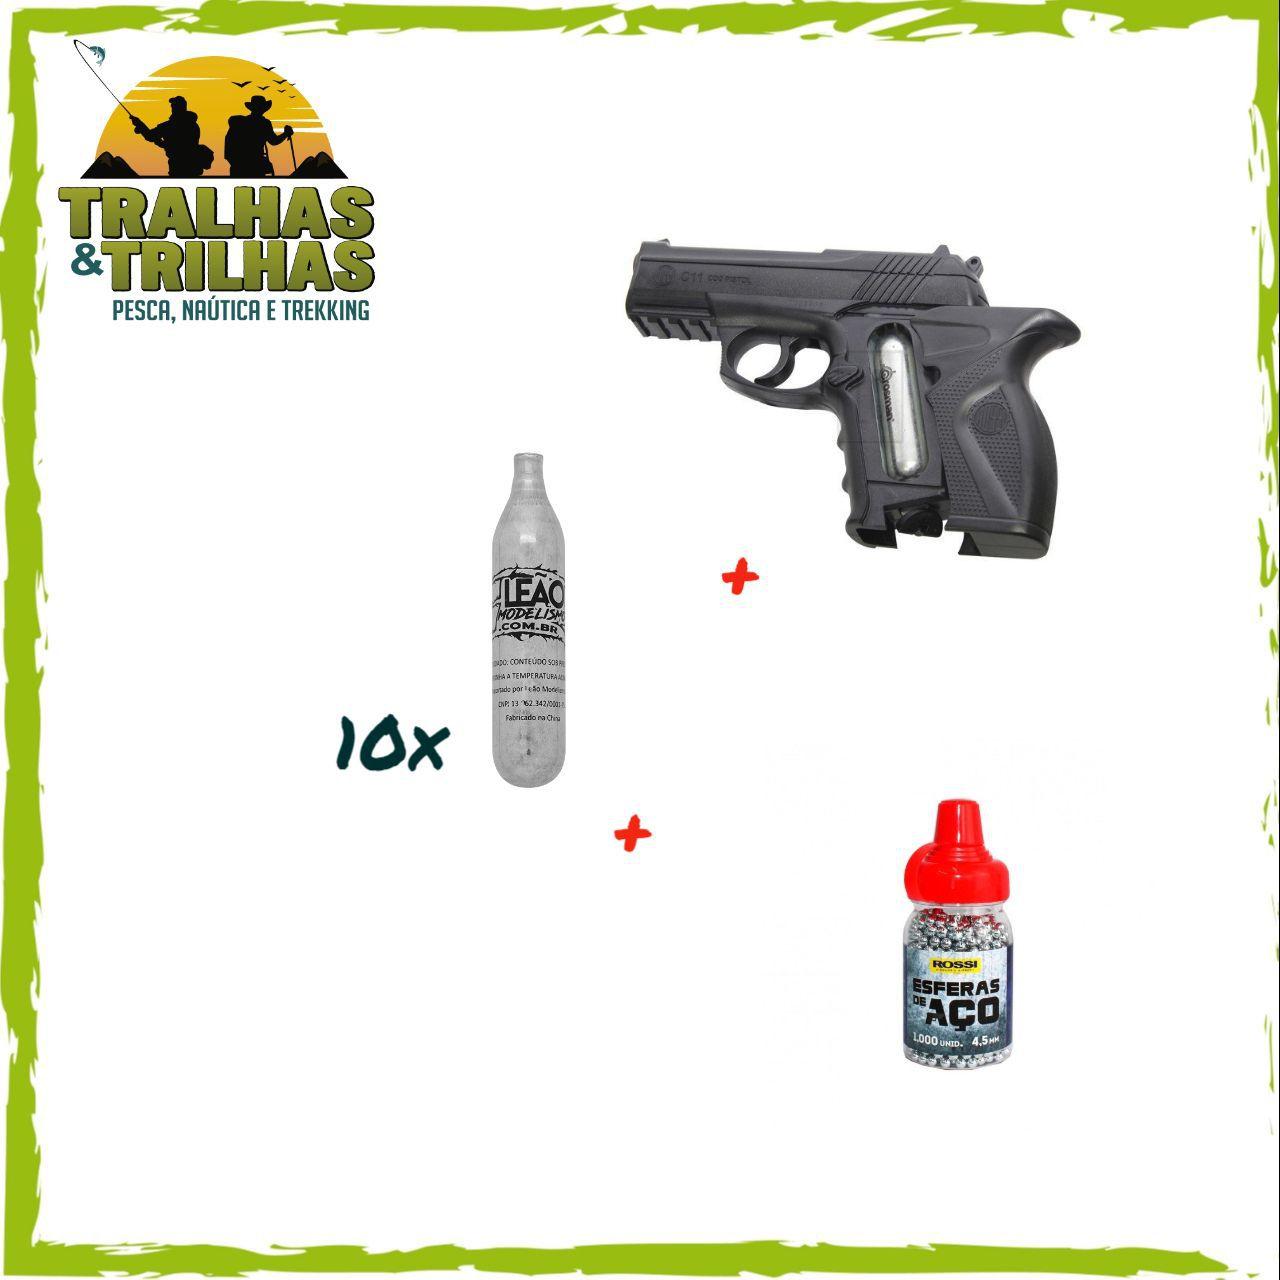 Pistola de Pressão Co2 WG Rossi C11 4,5mm - 17 Tiros  + 10 Capsulas de Co2 + 1.000 Esferas de Aço 4.5 MM